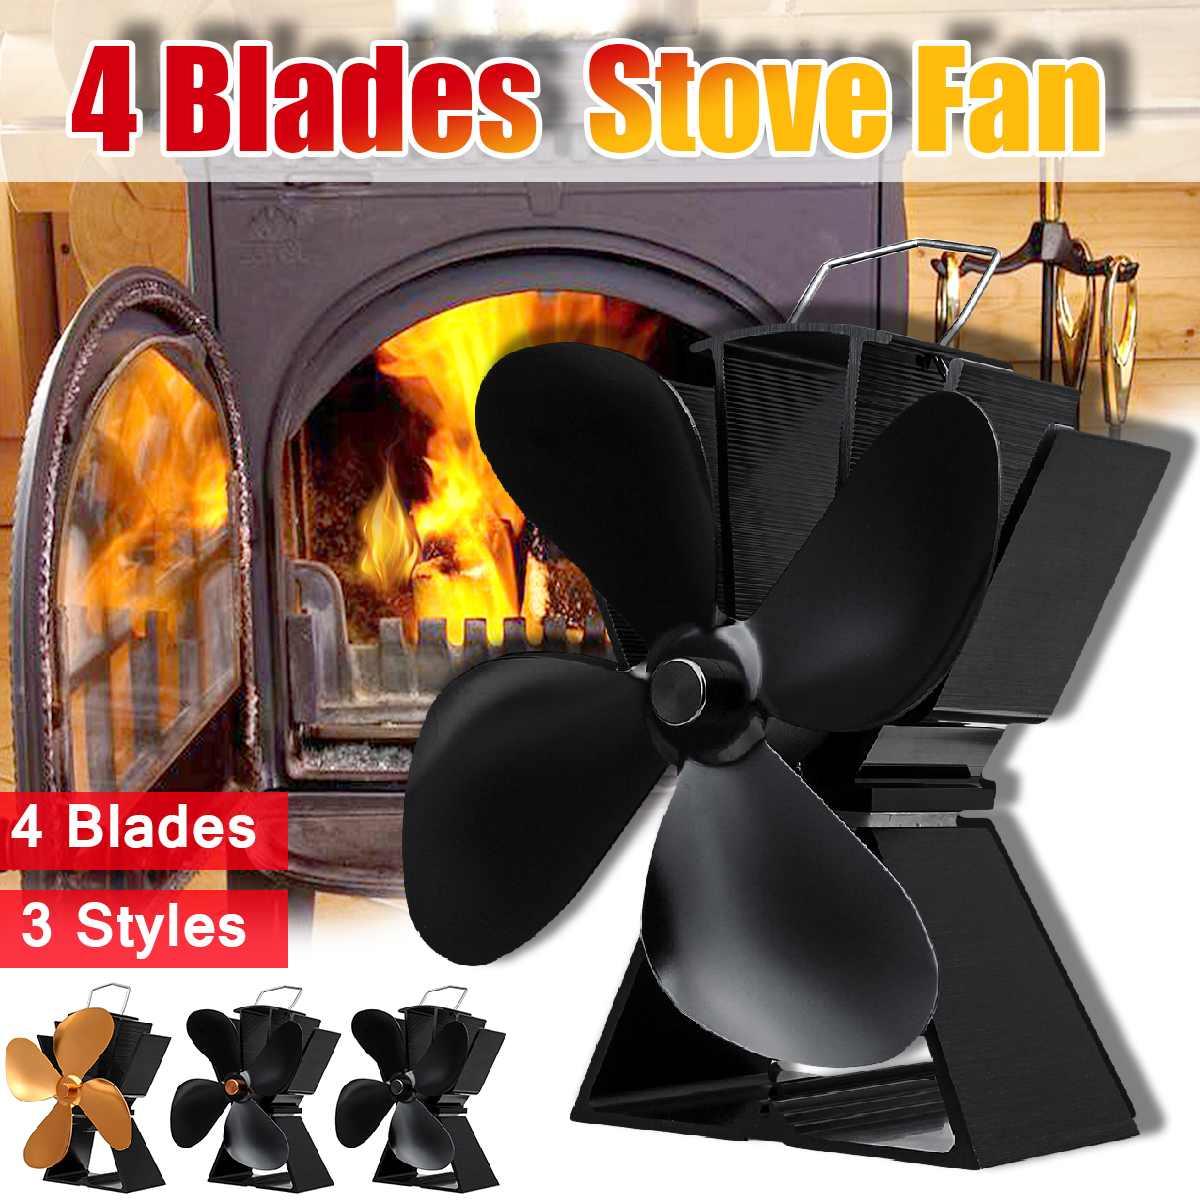 Home Fireplace 4 Blade Heat Powered Stove Fan Komin Log Wood Burner Eco Friendly Quiet Fan Efficient Heat Distribution